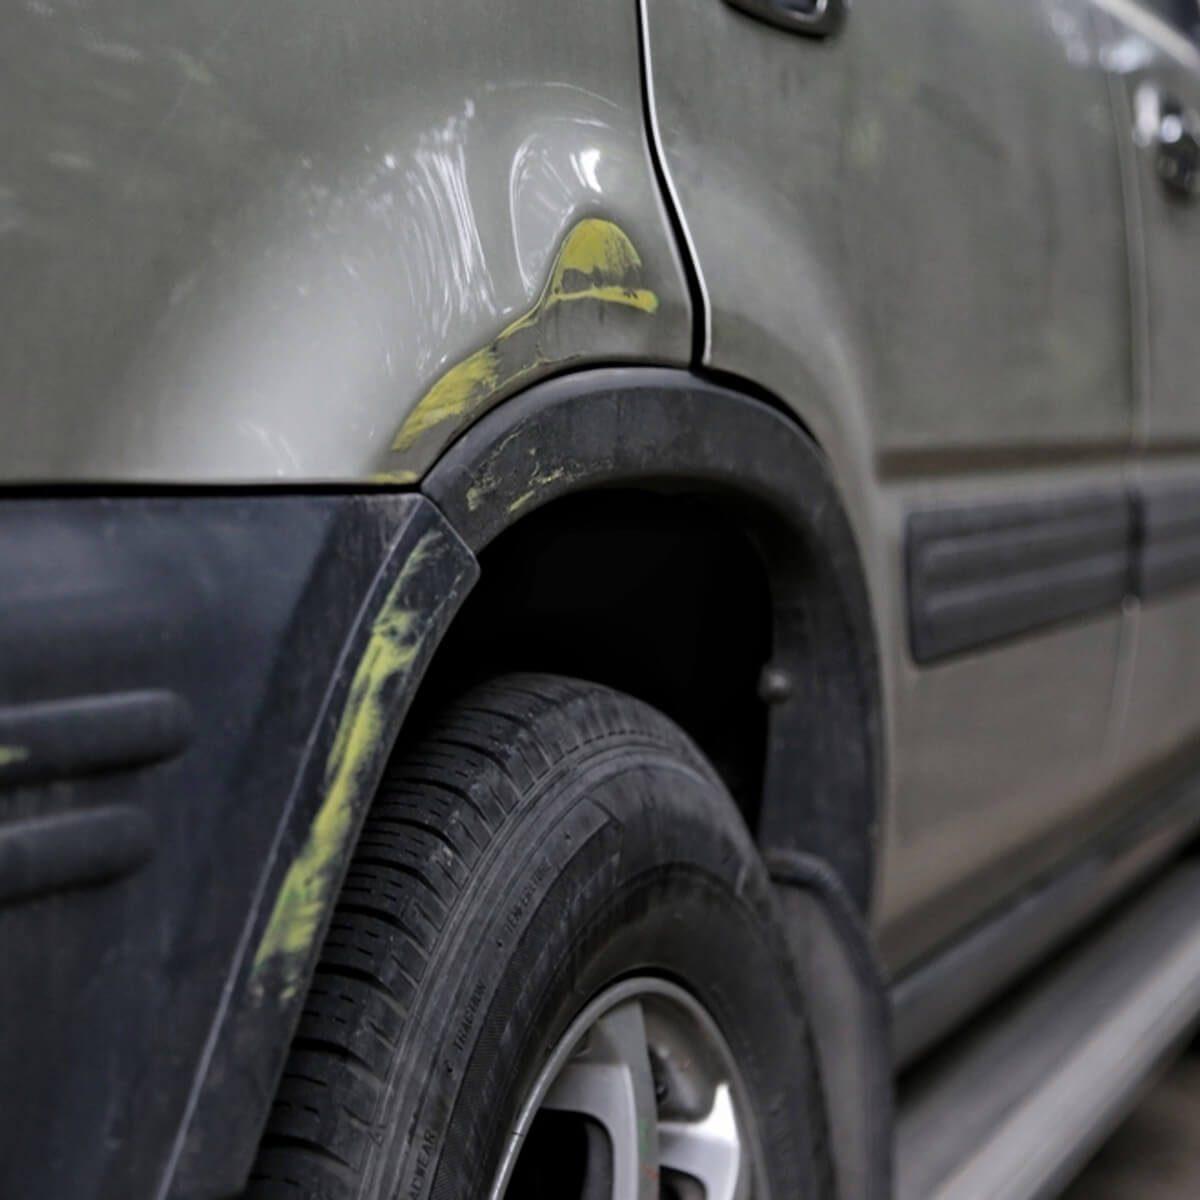 dfh10_shutterstock_697559497 car side molding